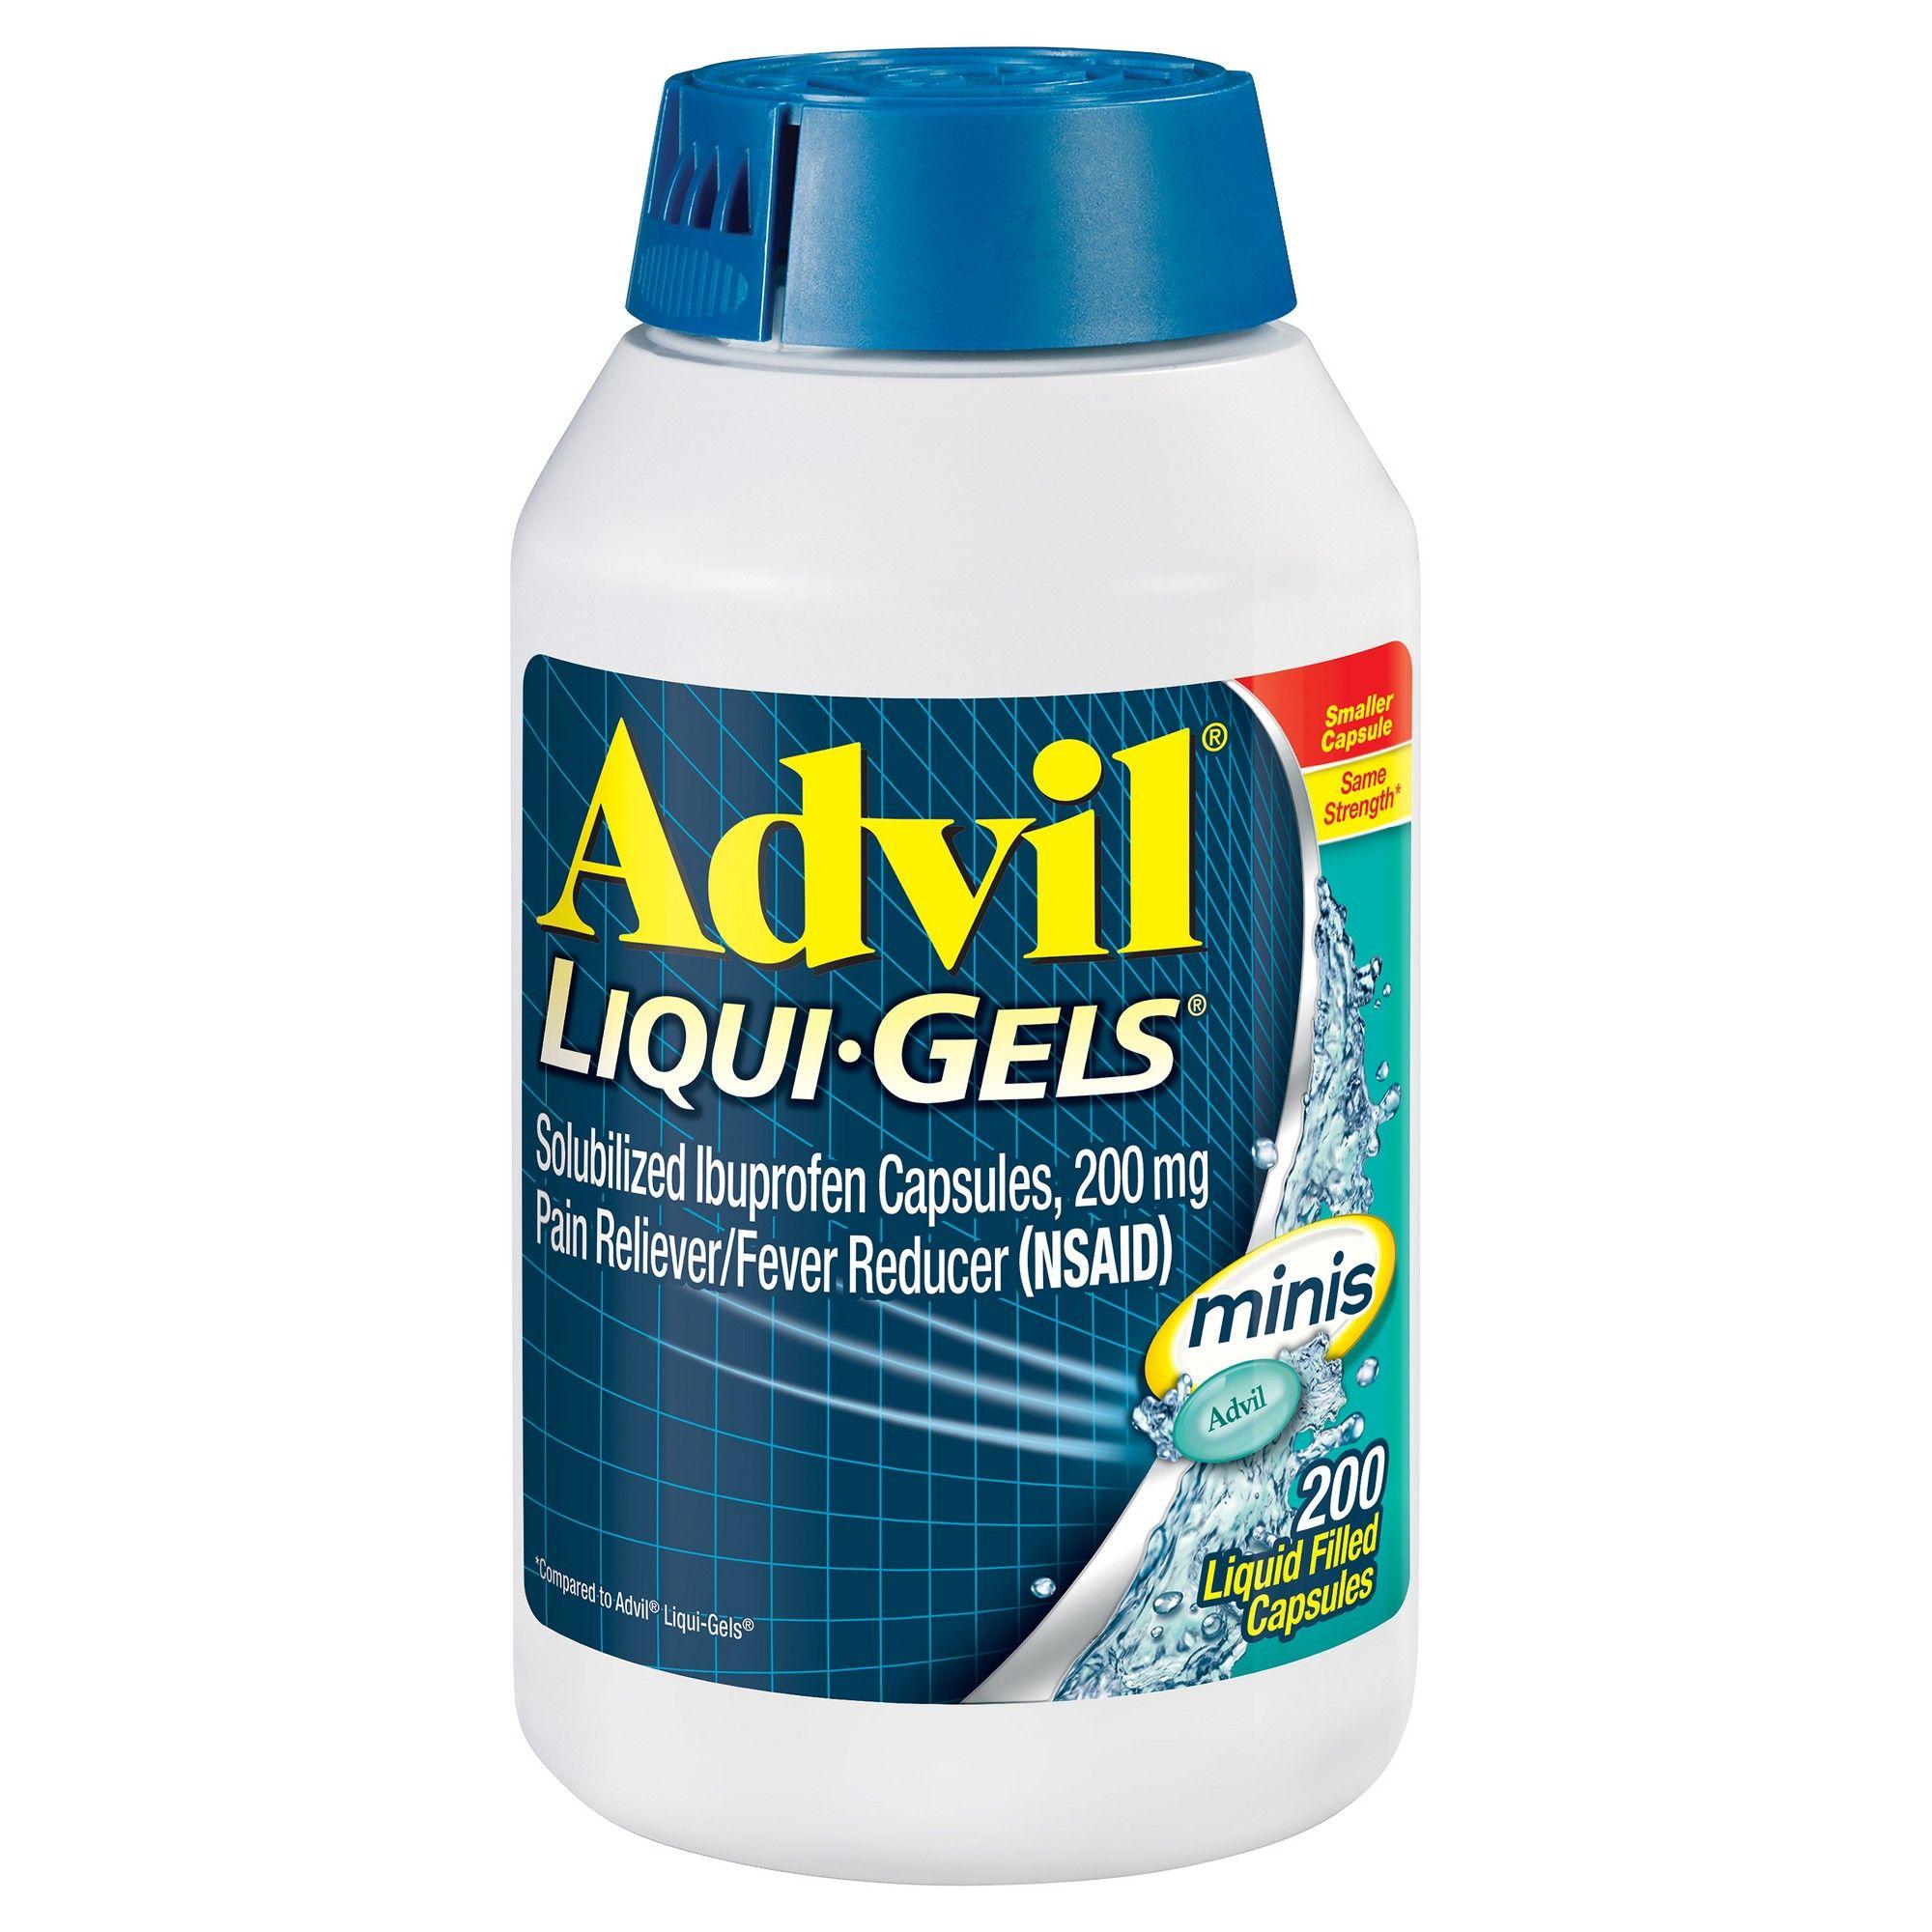 Advil Pain Reliever/Fever Reducer Liqui-Gel Minis - Ibuprofen (NSAID